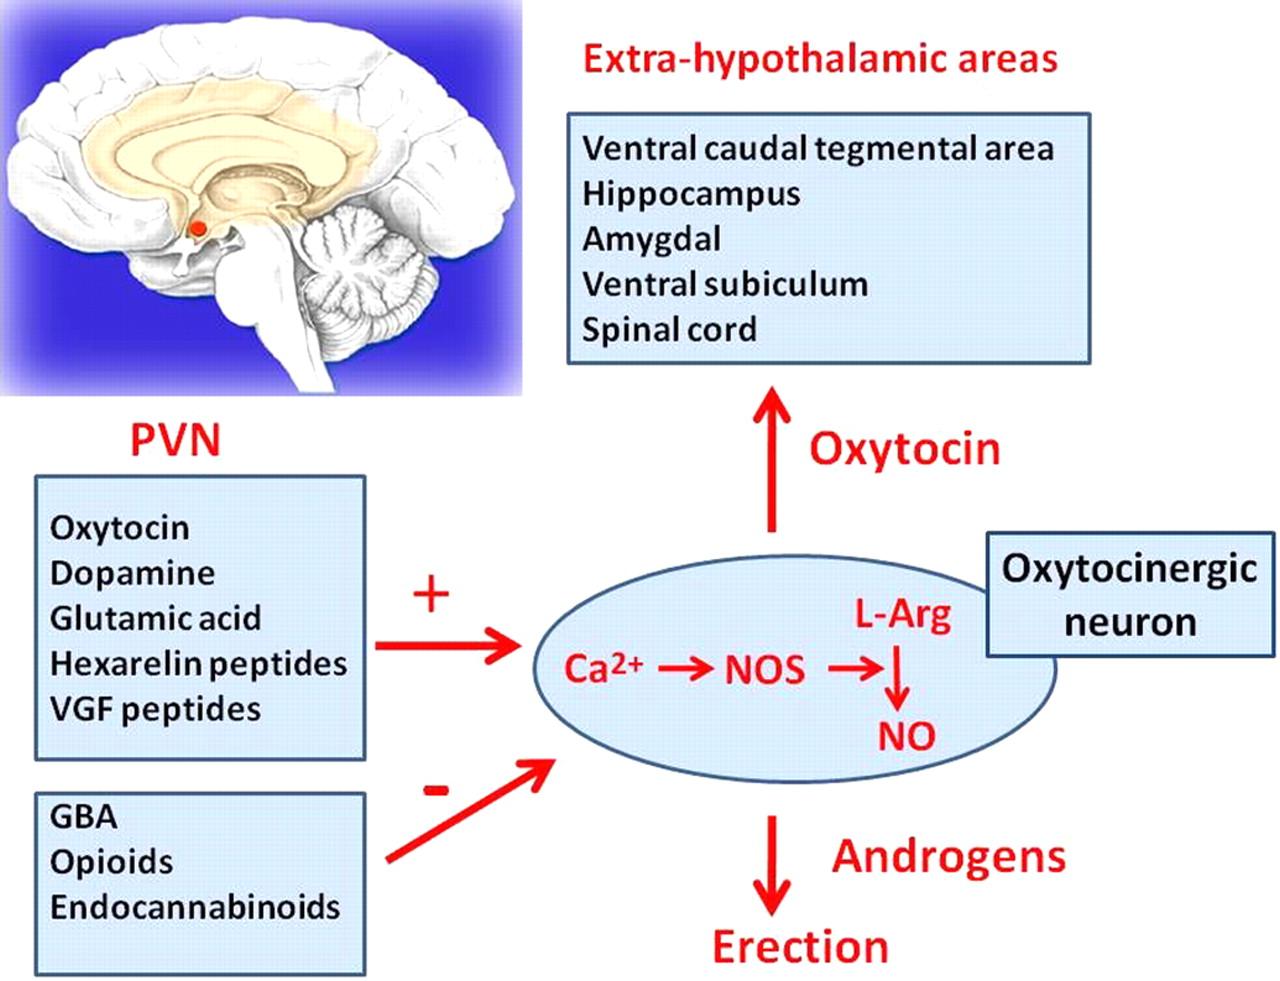 nerves responsible for erectile function